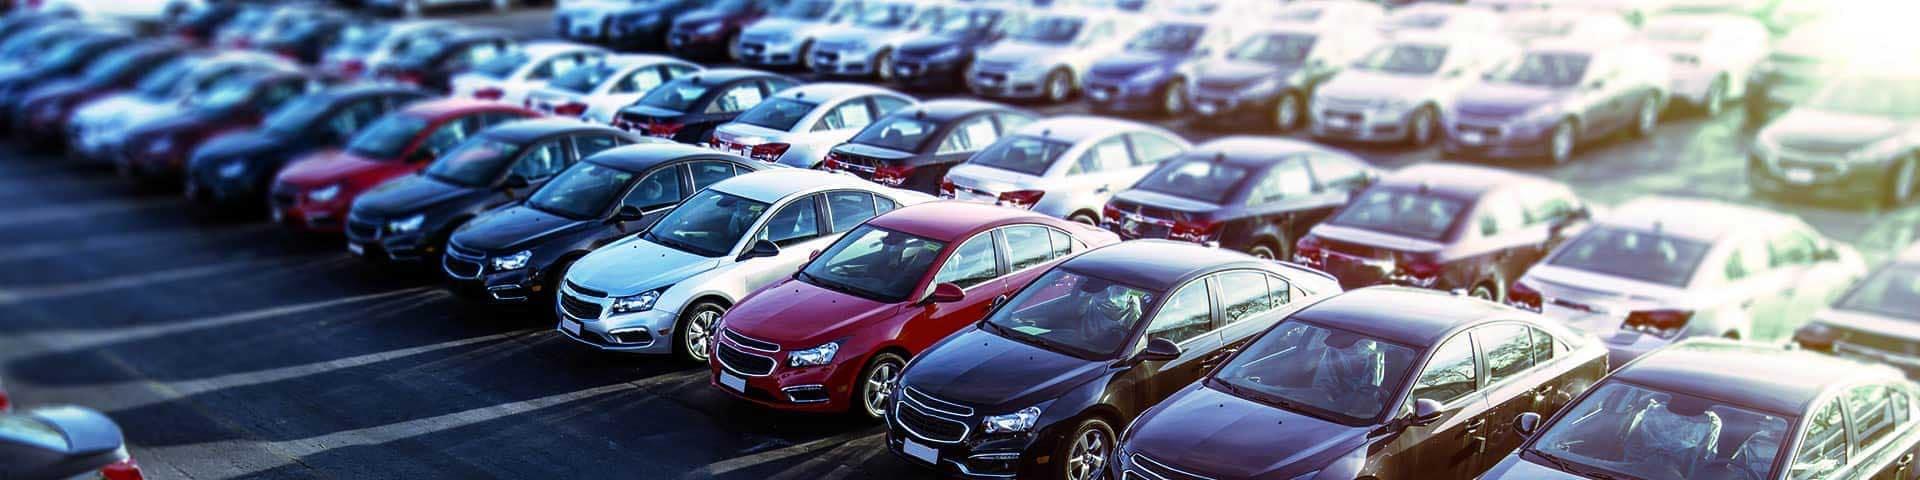 Used Cars for Sale at Burlington Volkswagen